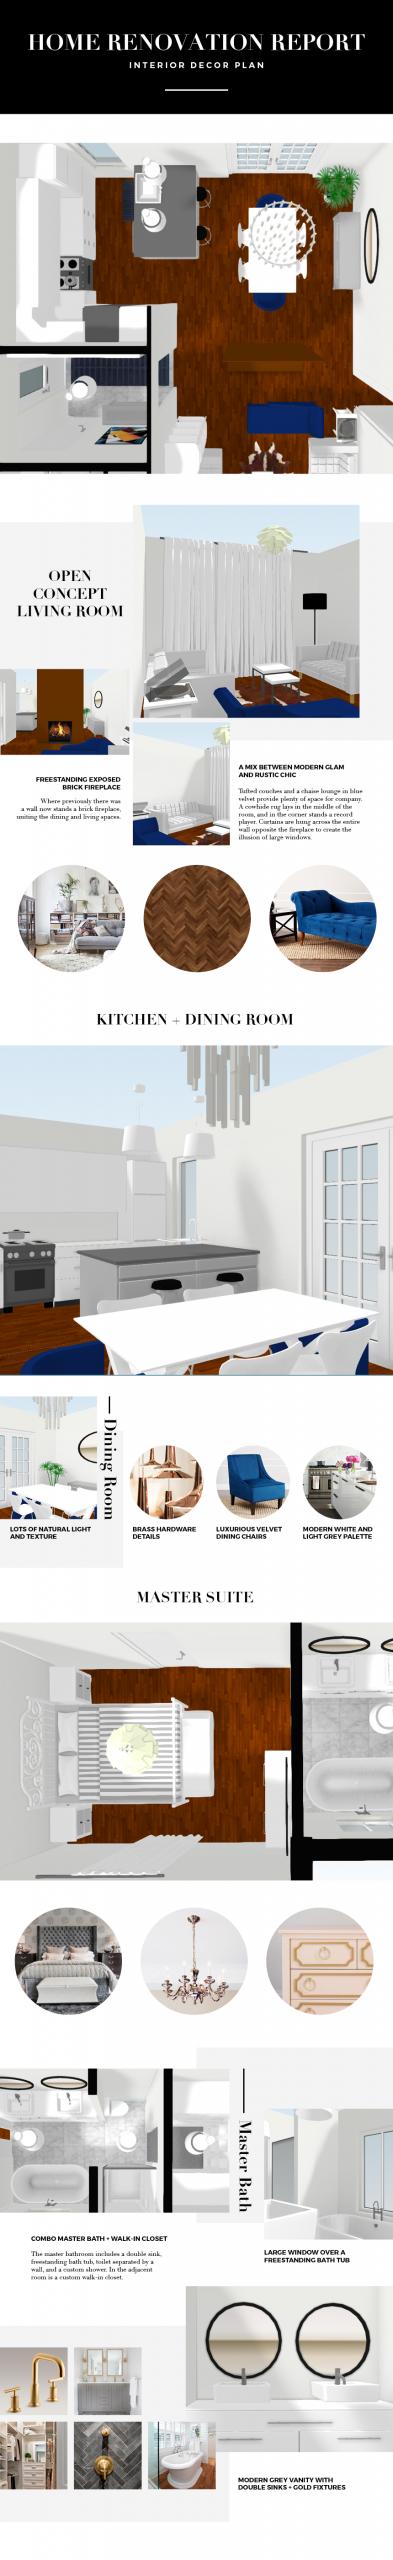 Home Renovation Report | Interior Decor Plan